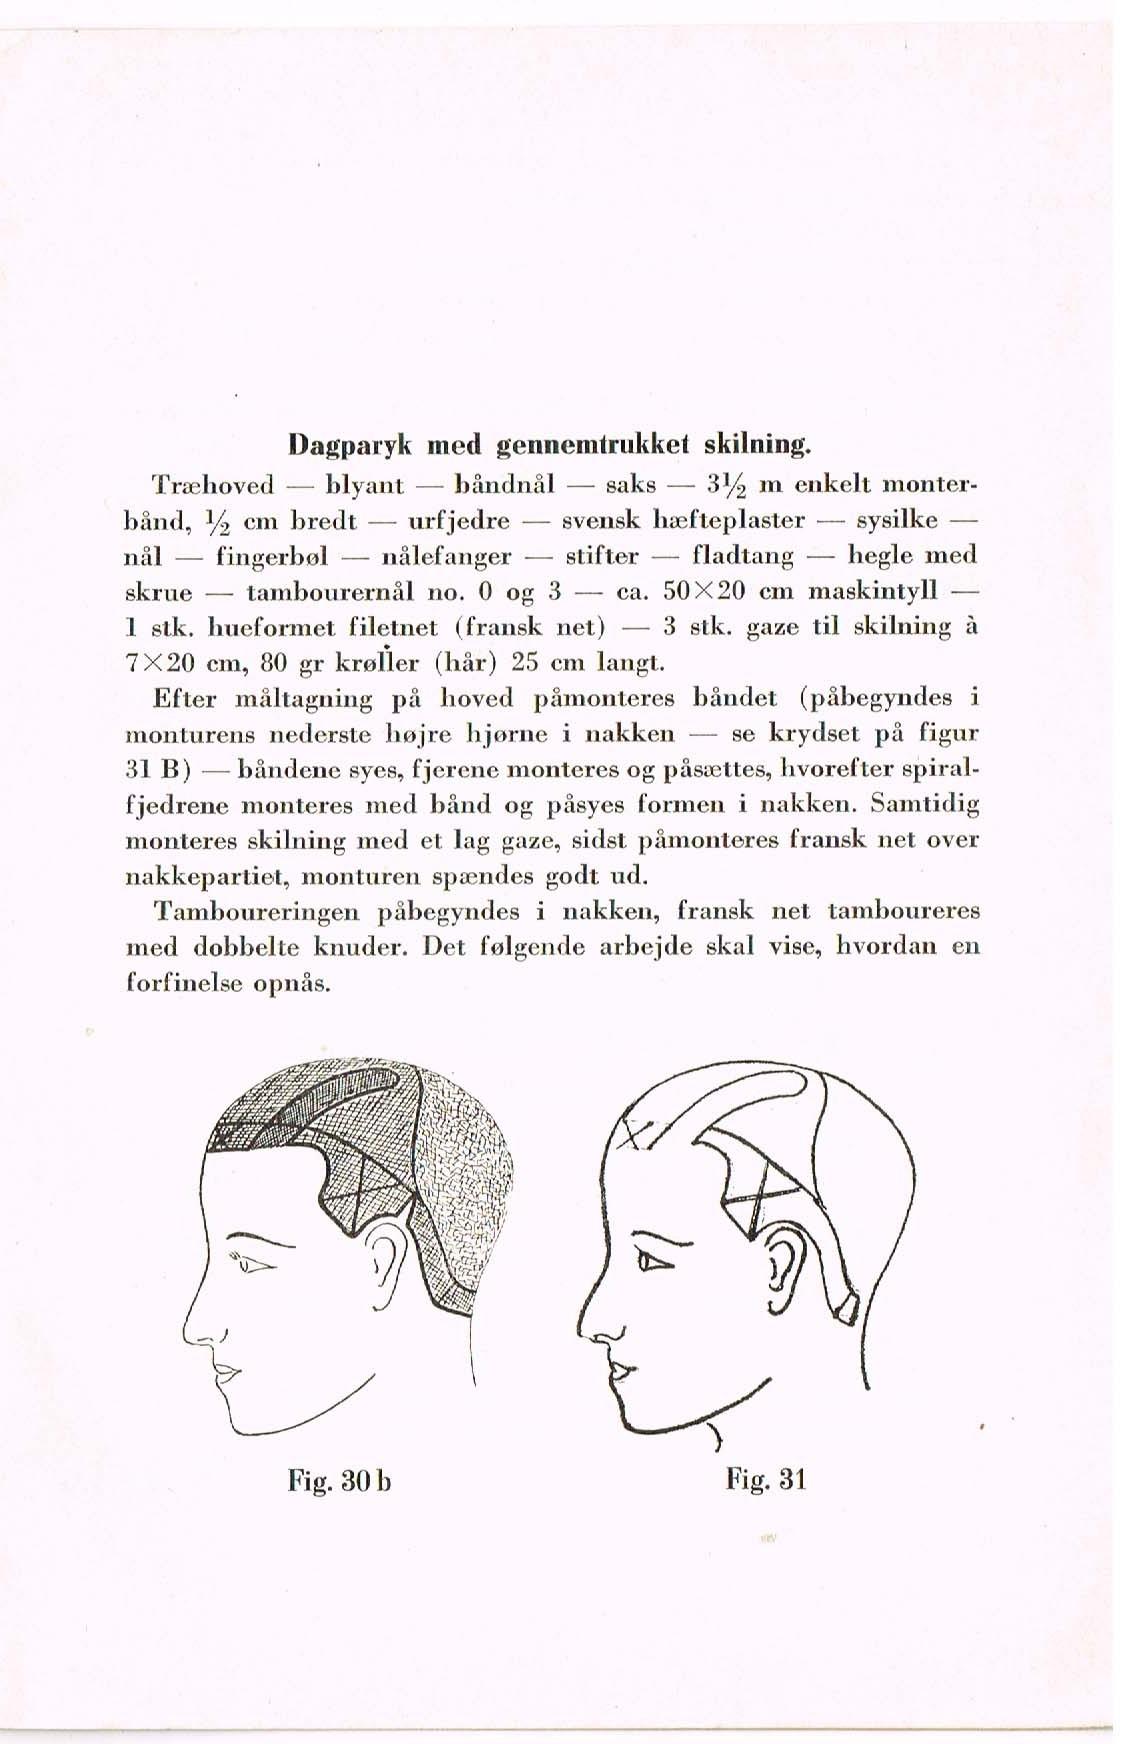 frisør erhvervet parykmagerklasse 1